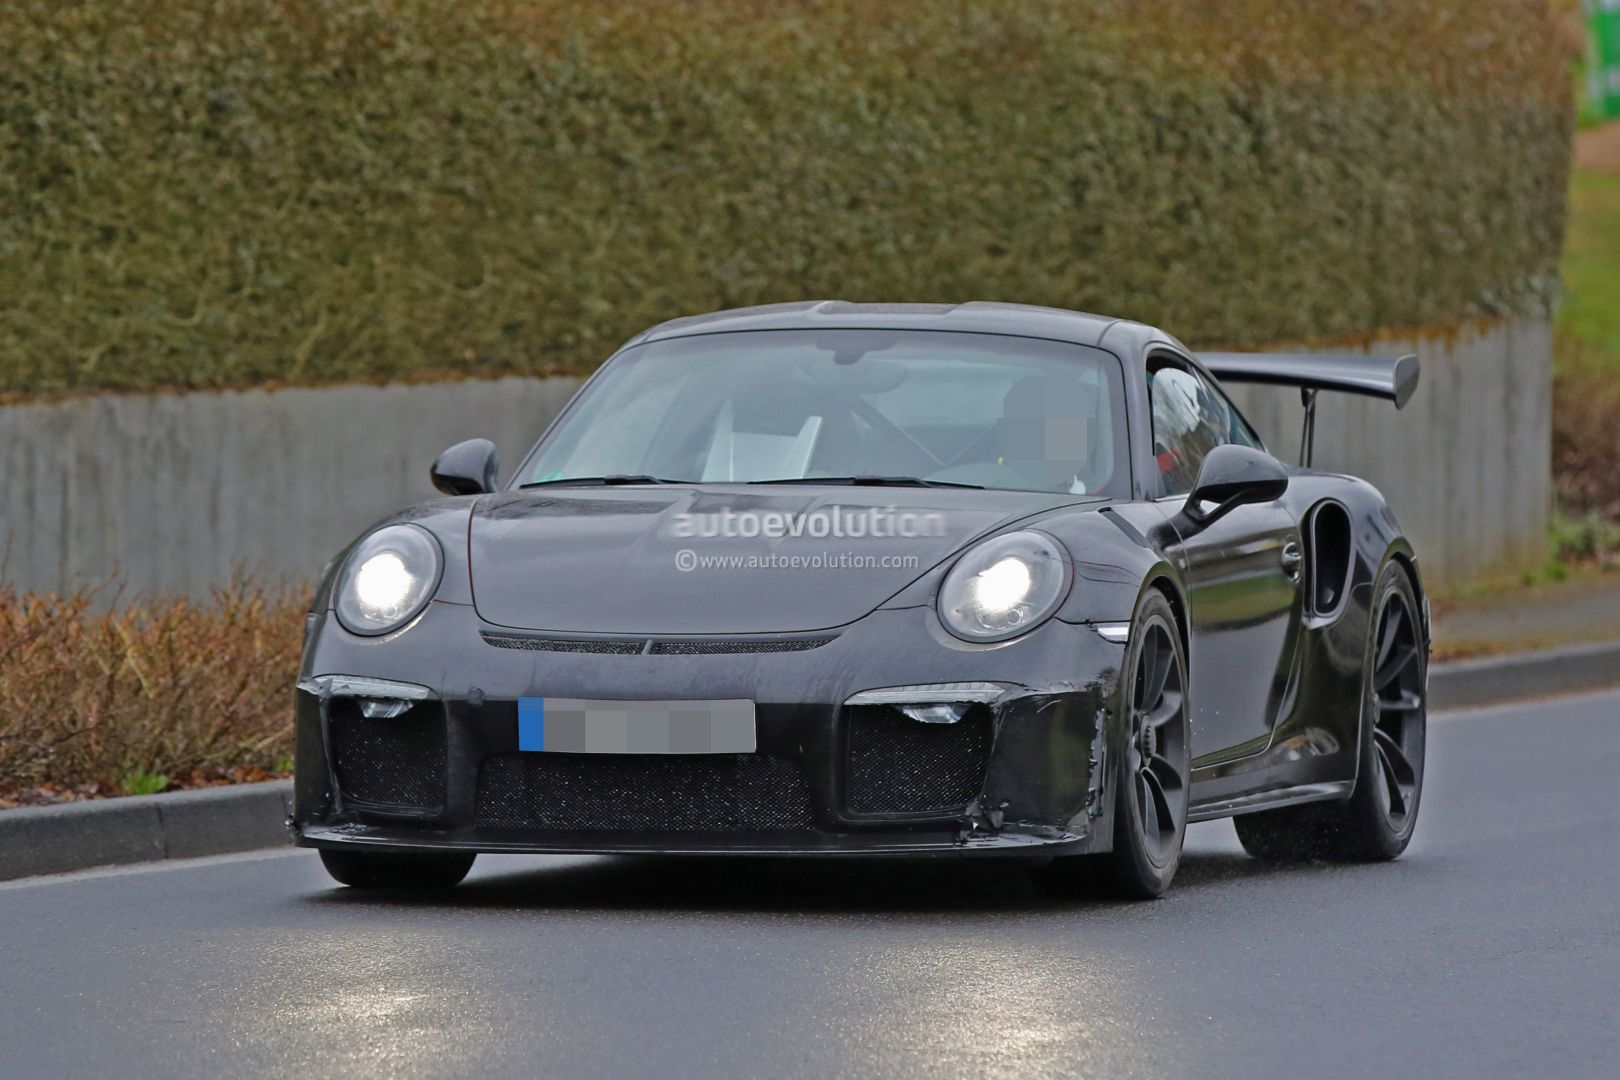 2018 Porsche 911 GT3 RS Spied, Has 4.2L Engine, 911 R-like Rear Diffuser - autoevolution